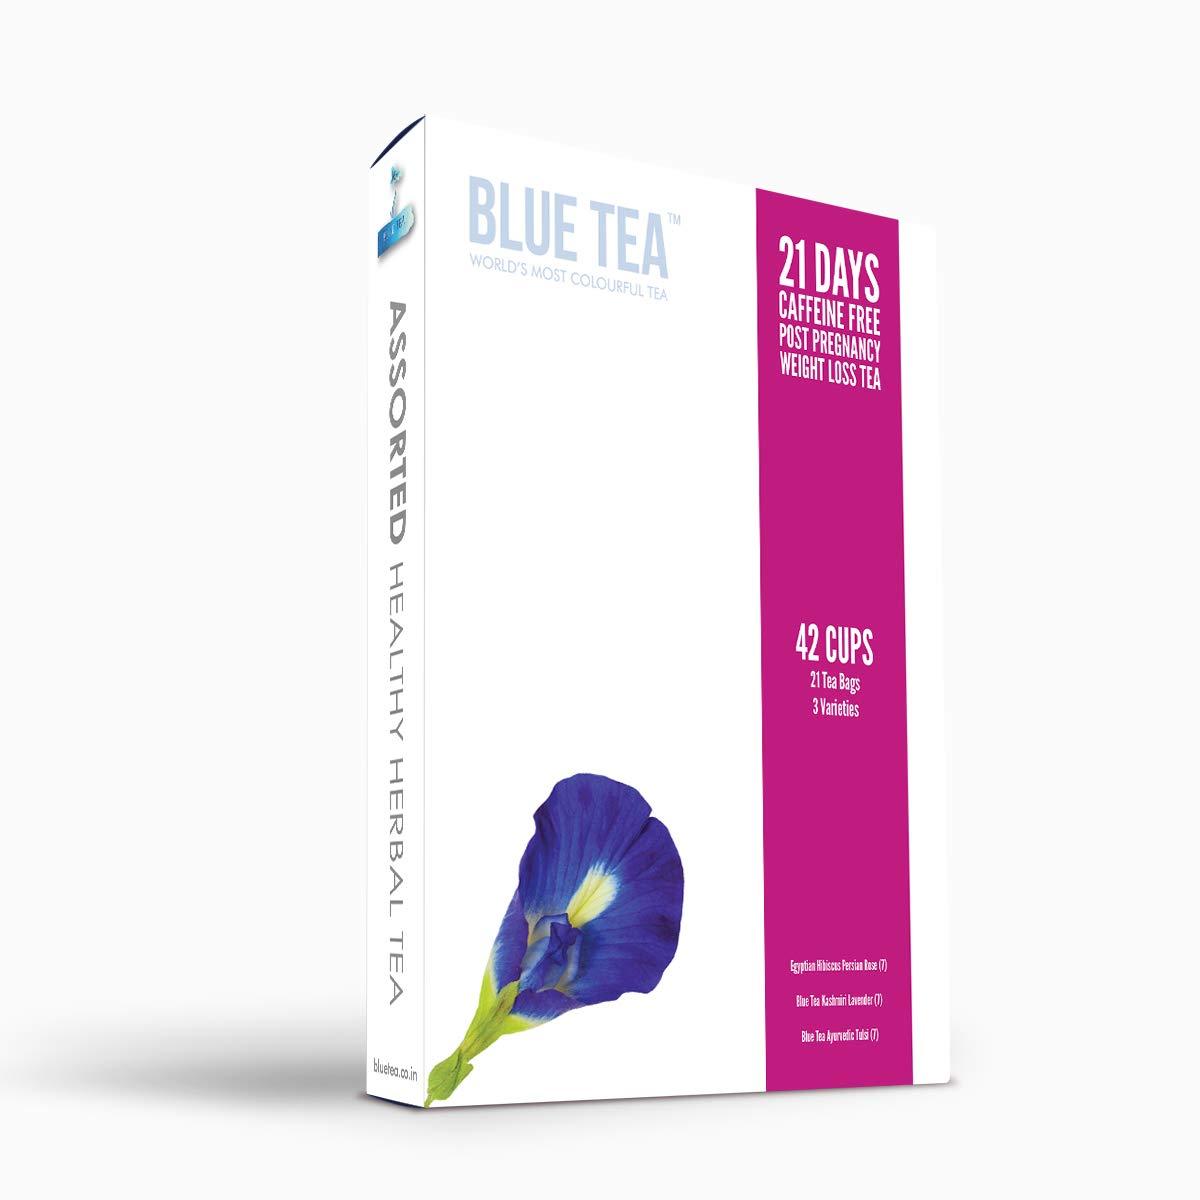 Blue Tea 21 Days Caffeine Free Post Pregnancy Weight Loss Tea Zero